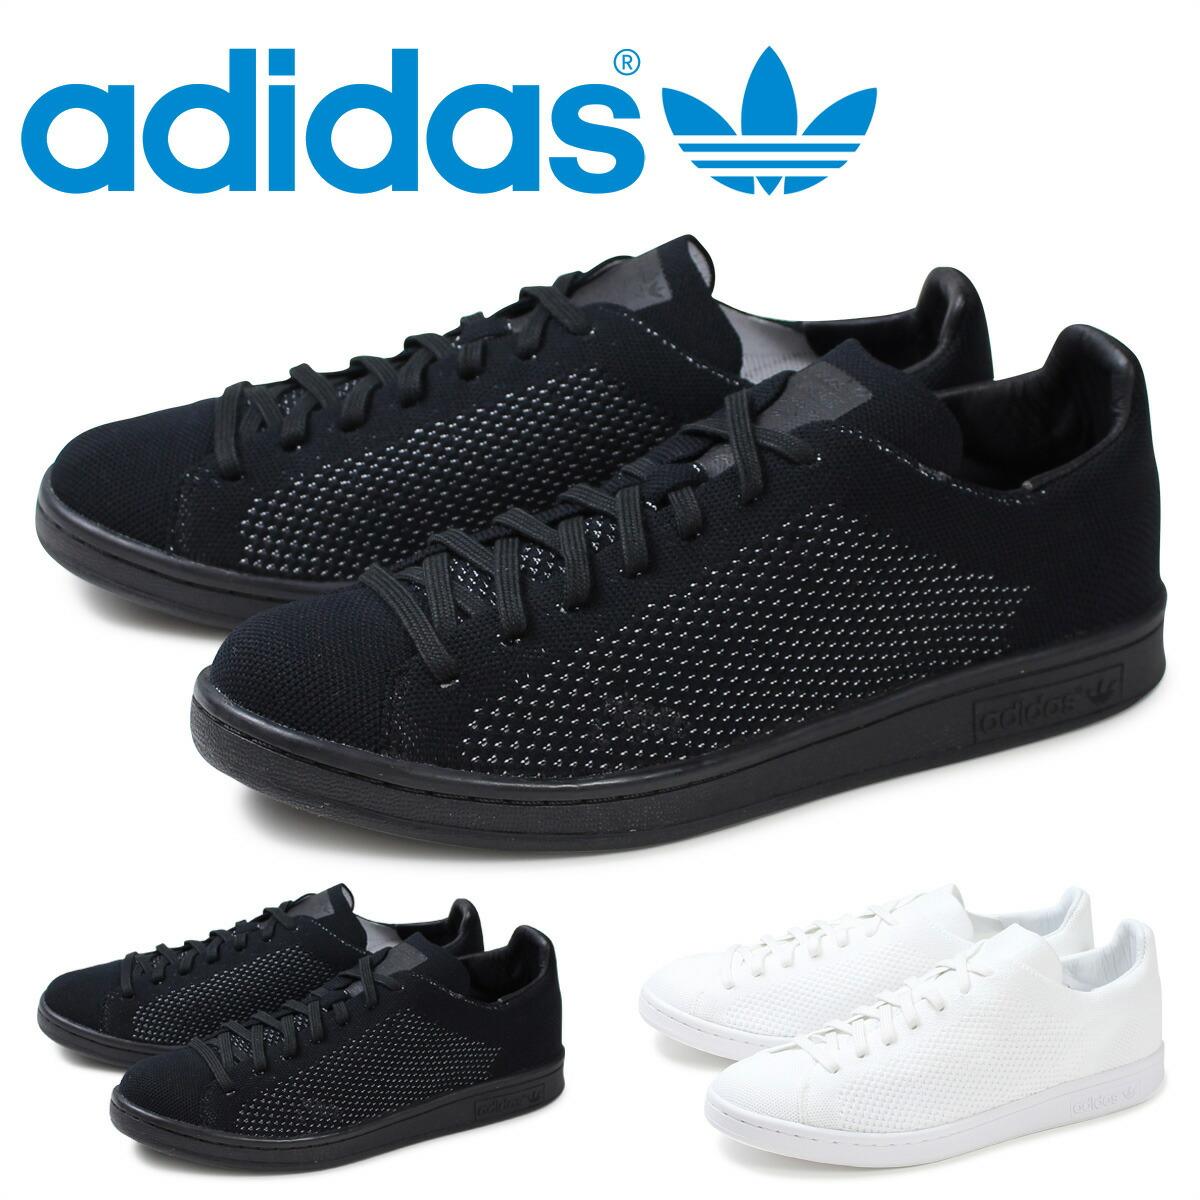 Adidas originals Stan Smith adidas Originals sneakers STAN SMITH PRIMEKNIT men S80065 white black